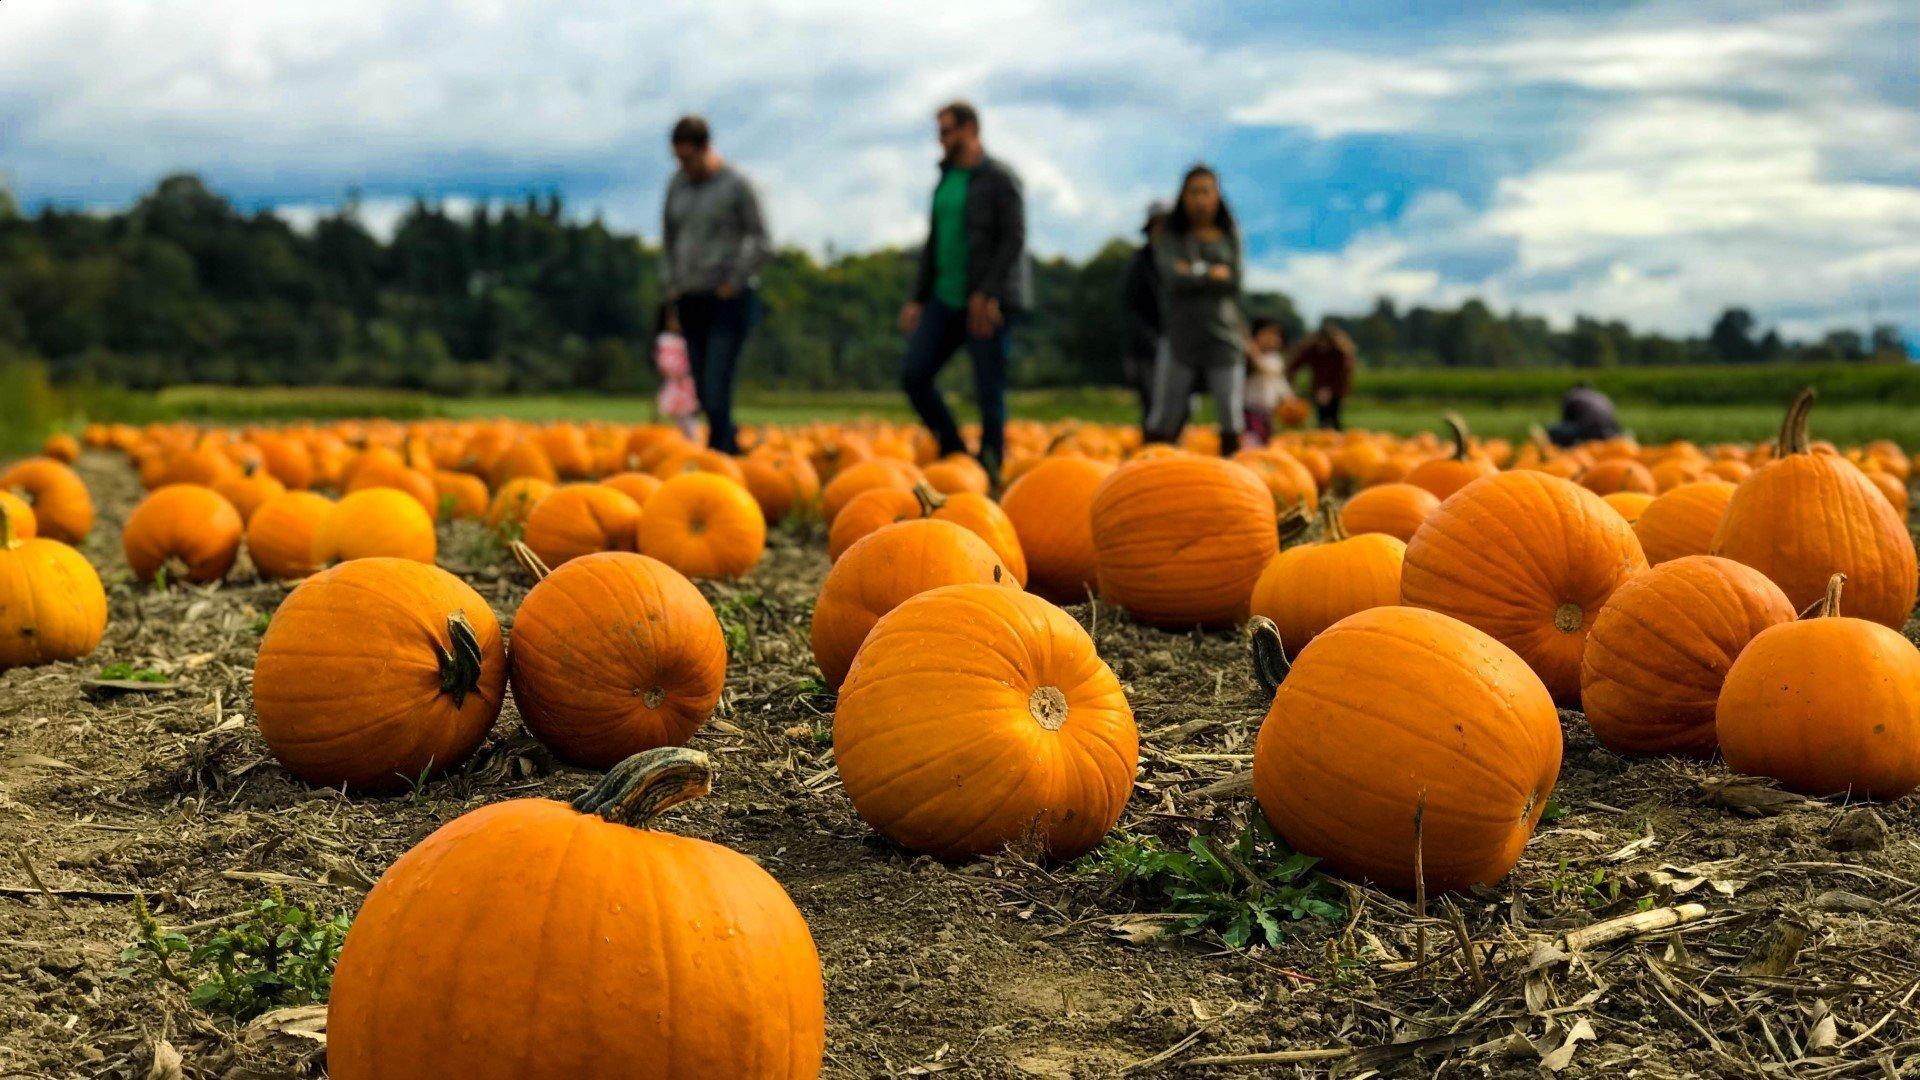 Pumpkin Picking at Hadsham Farm